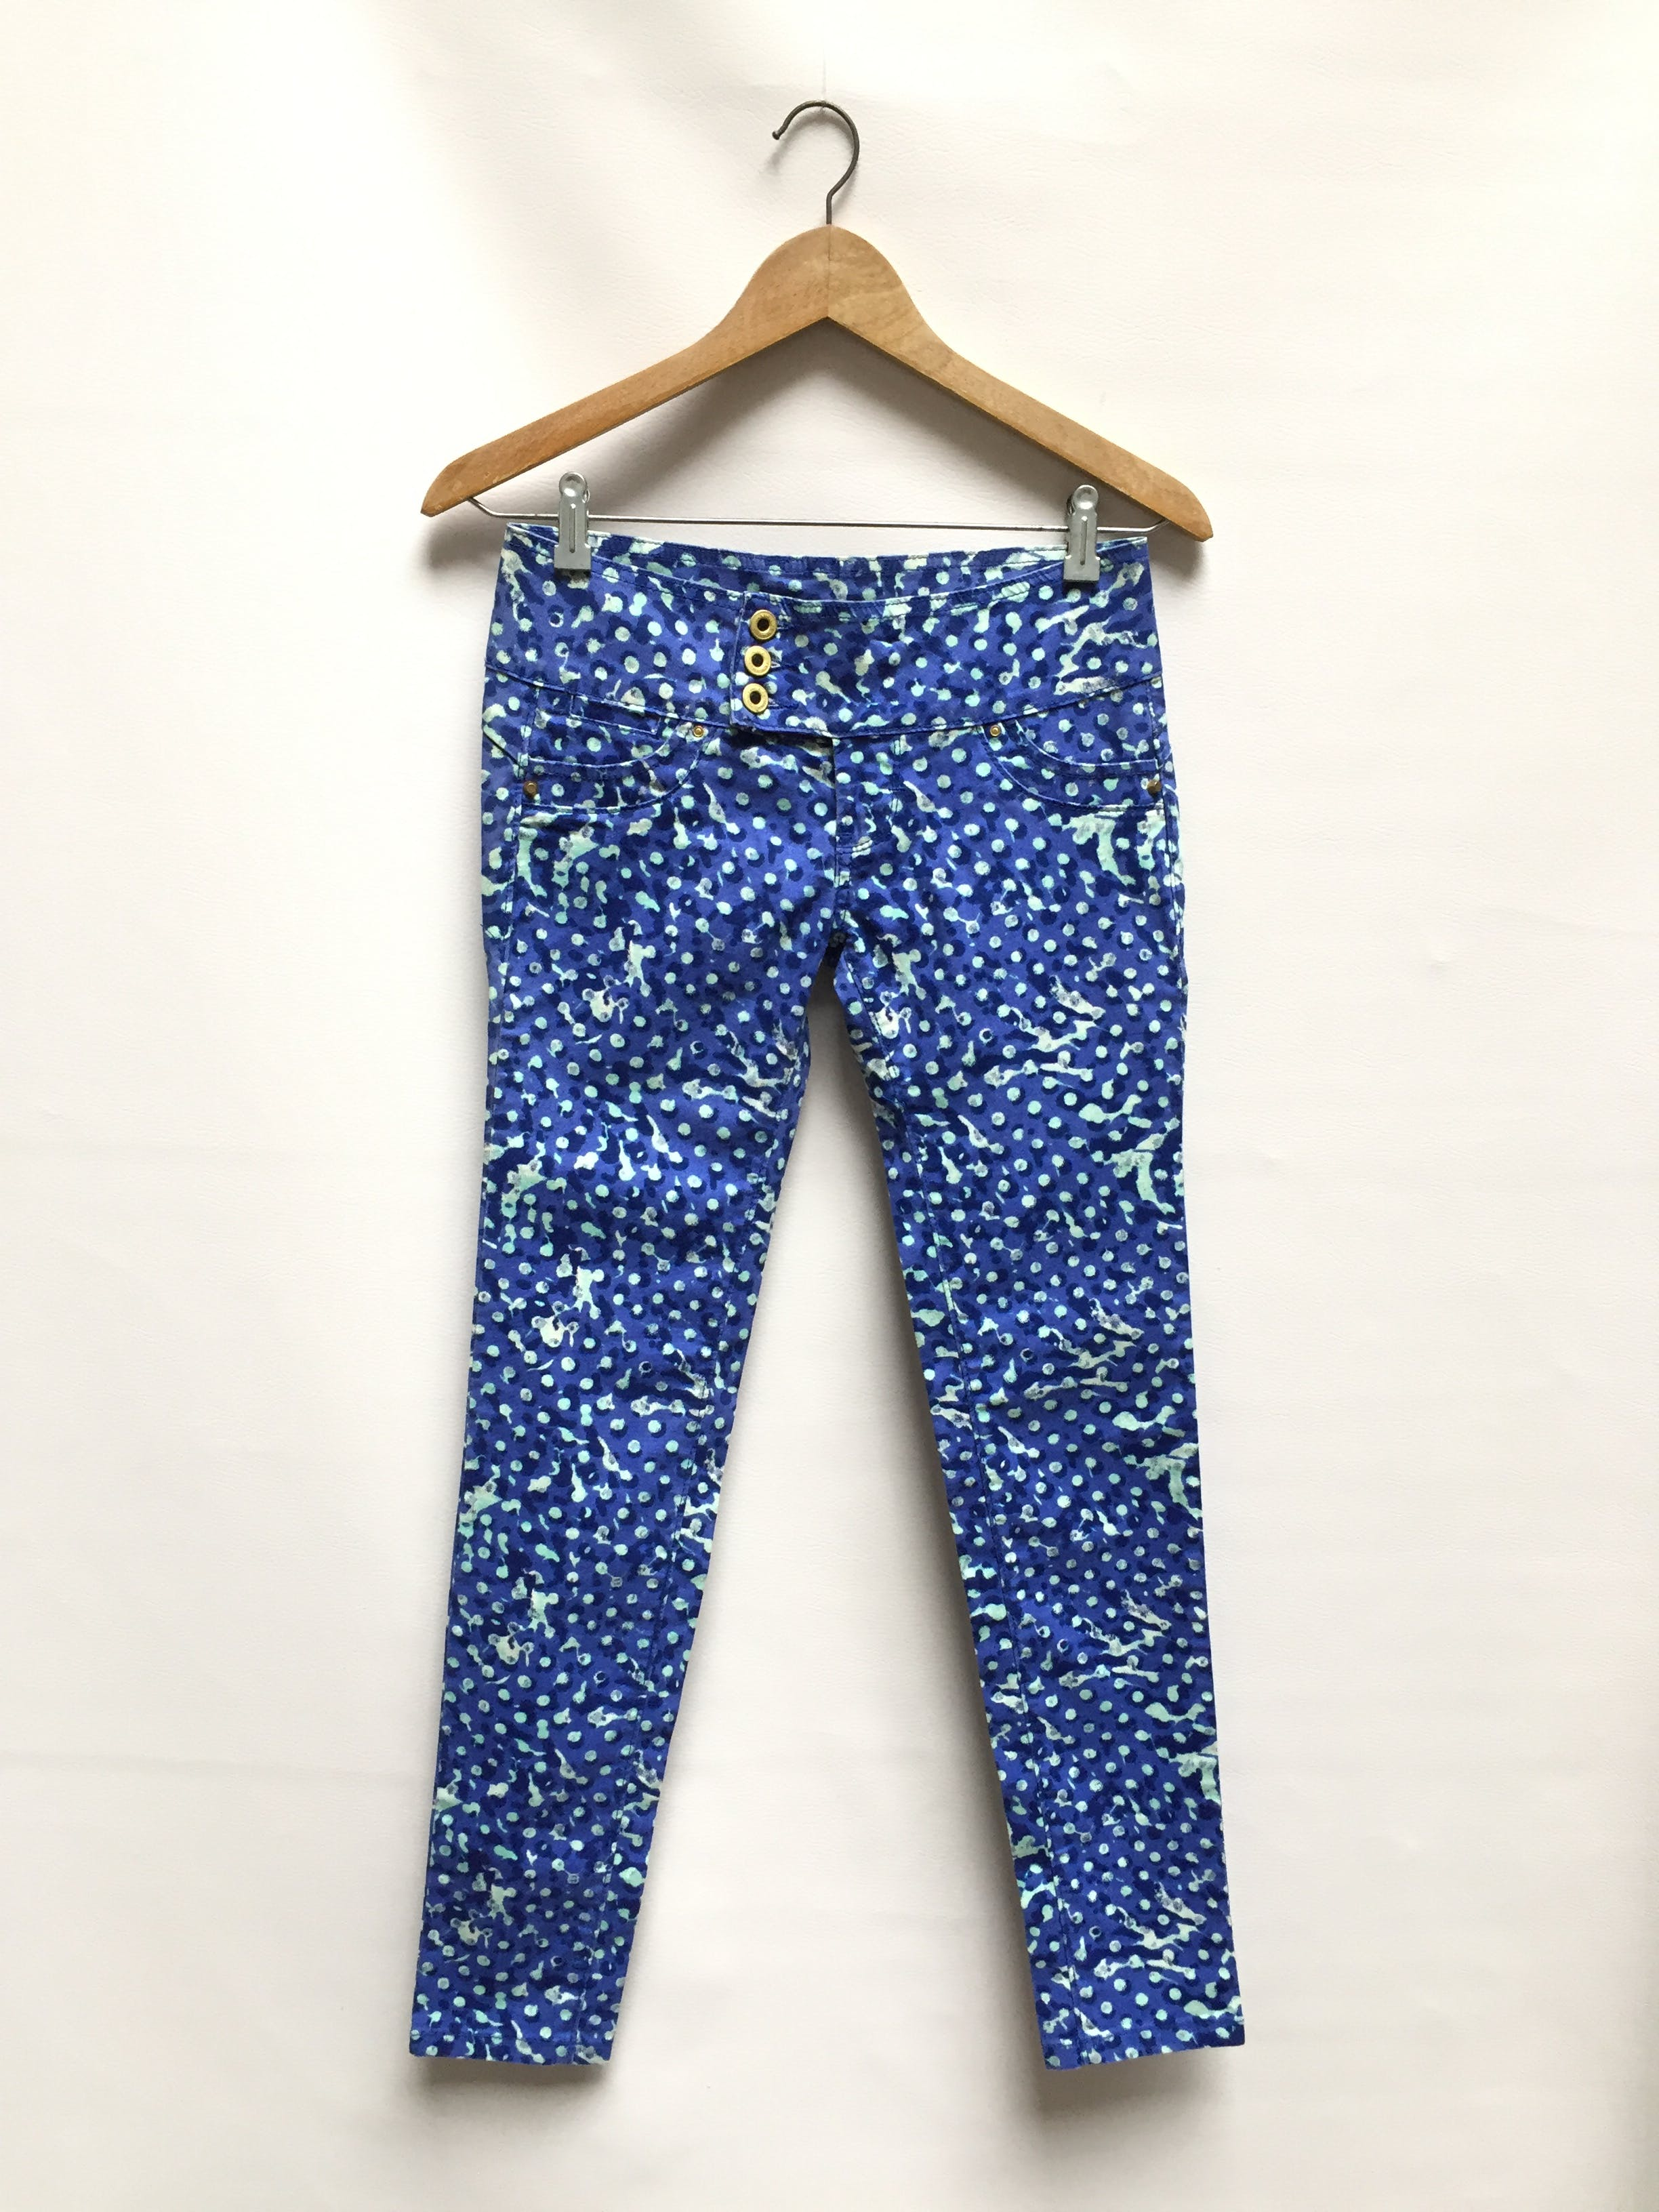 pantalon jean-F Jeans-imagen